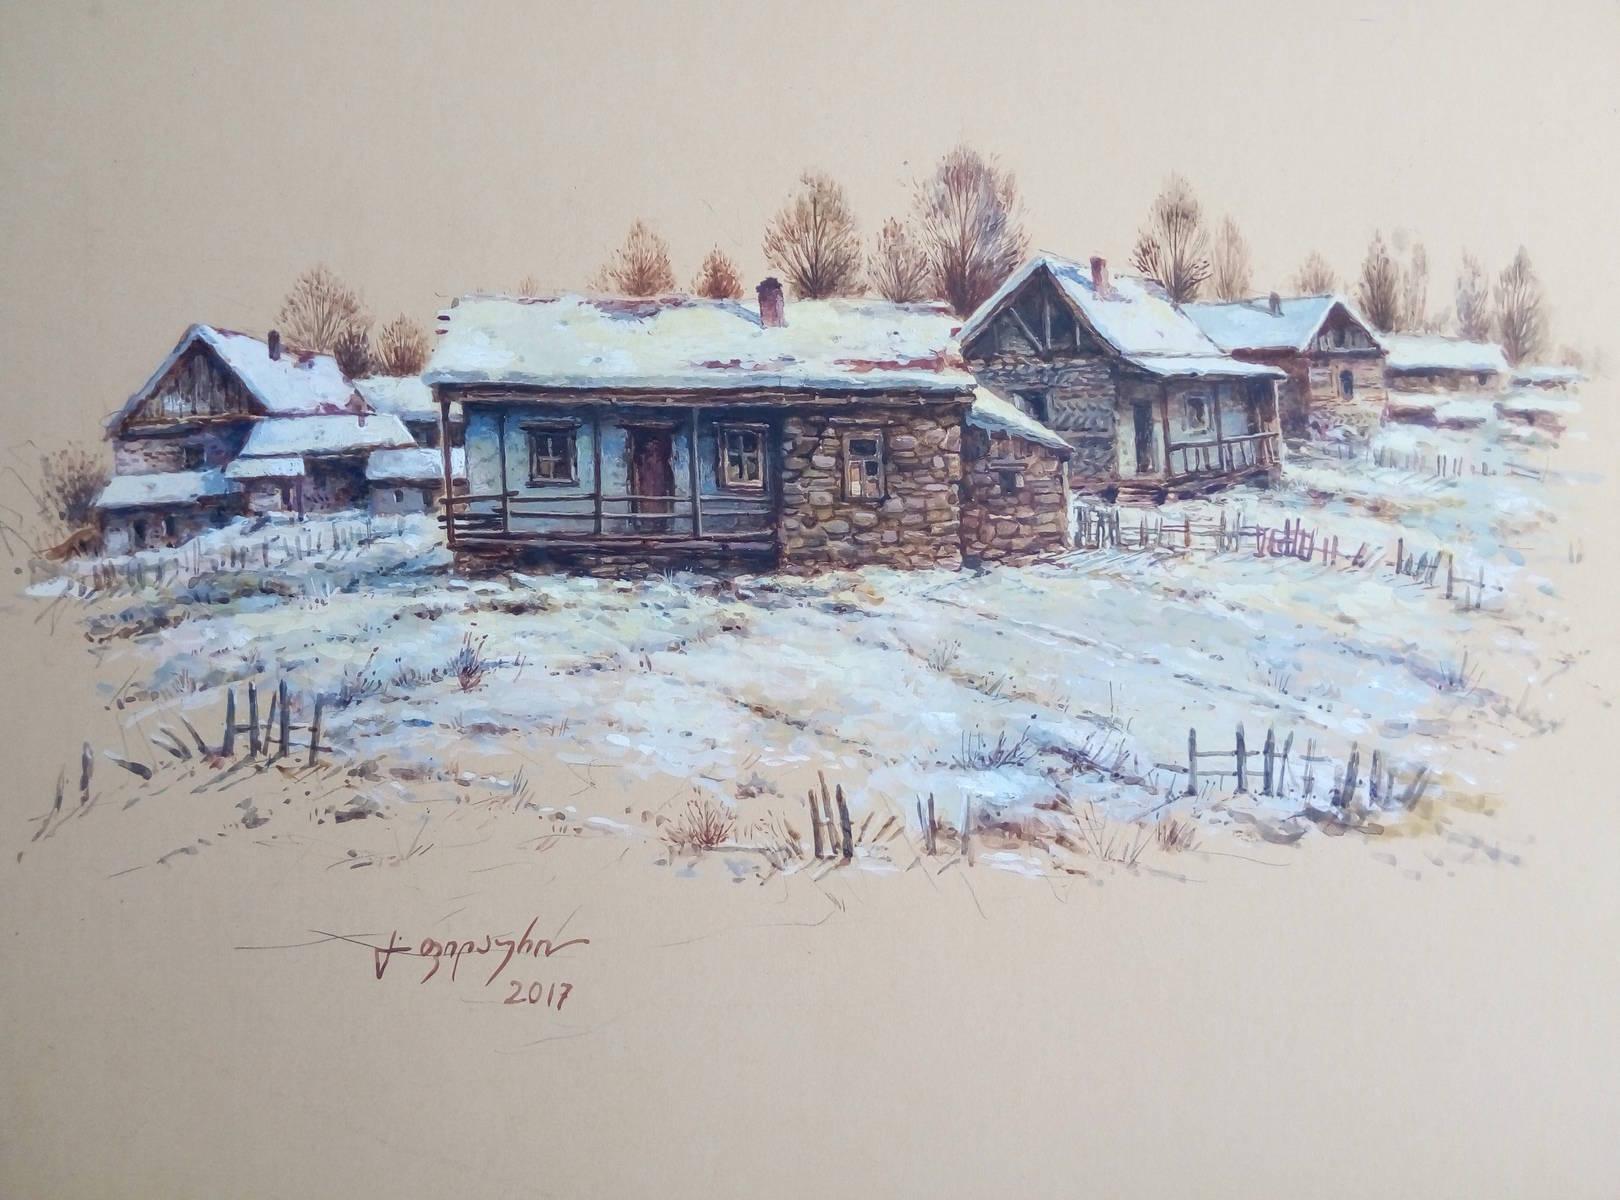 «Деревенька зимой»          бумага, акварель, гуашь «The village in the winter»   paper, aquarelle, gouache 28x40, 2017